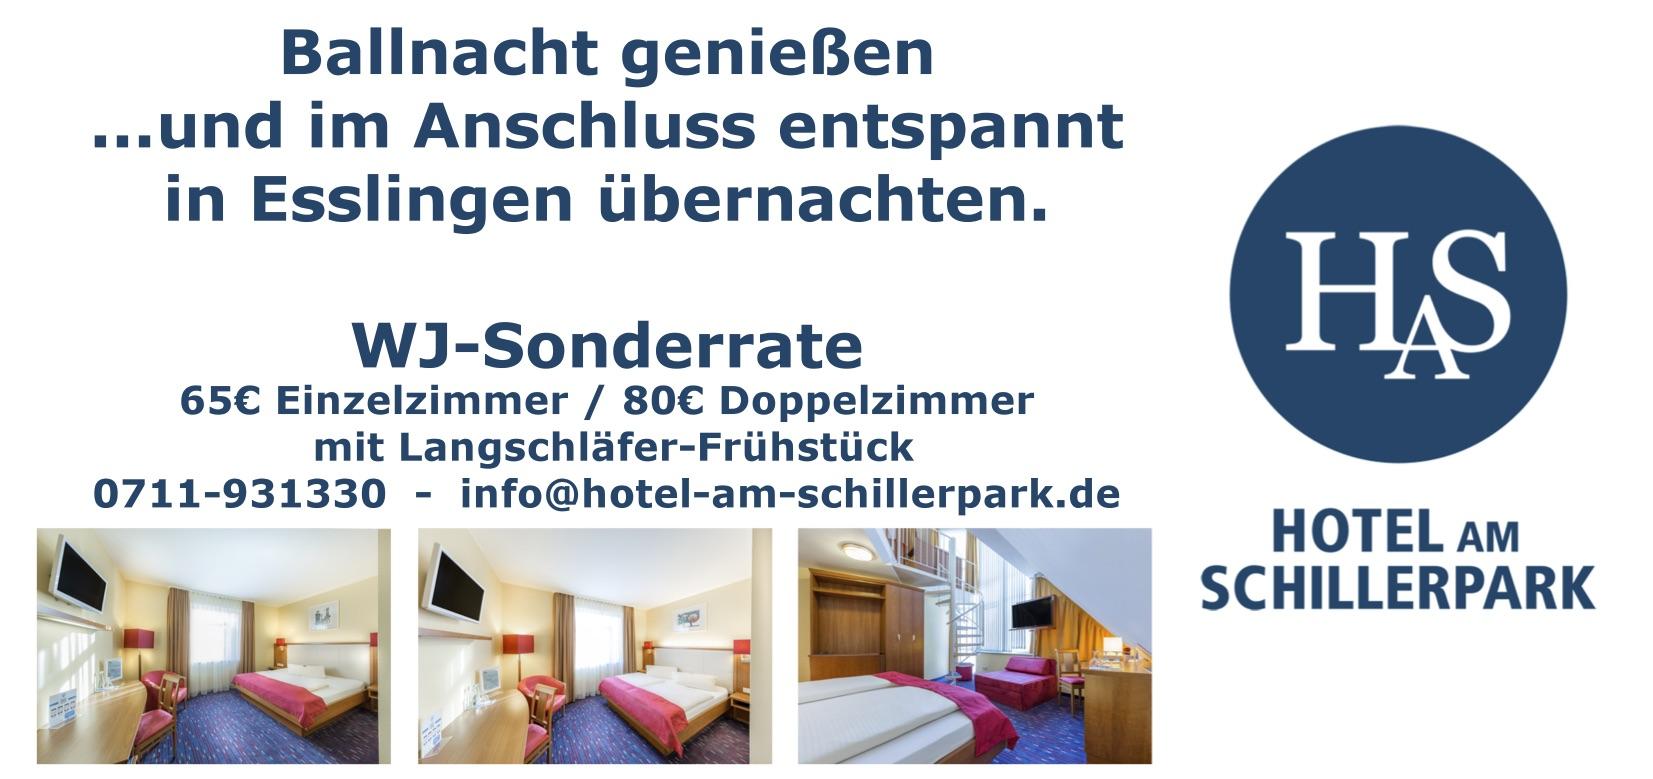 Ballangebot Hotel am Schillerpark